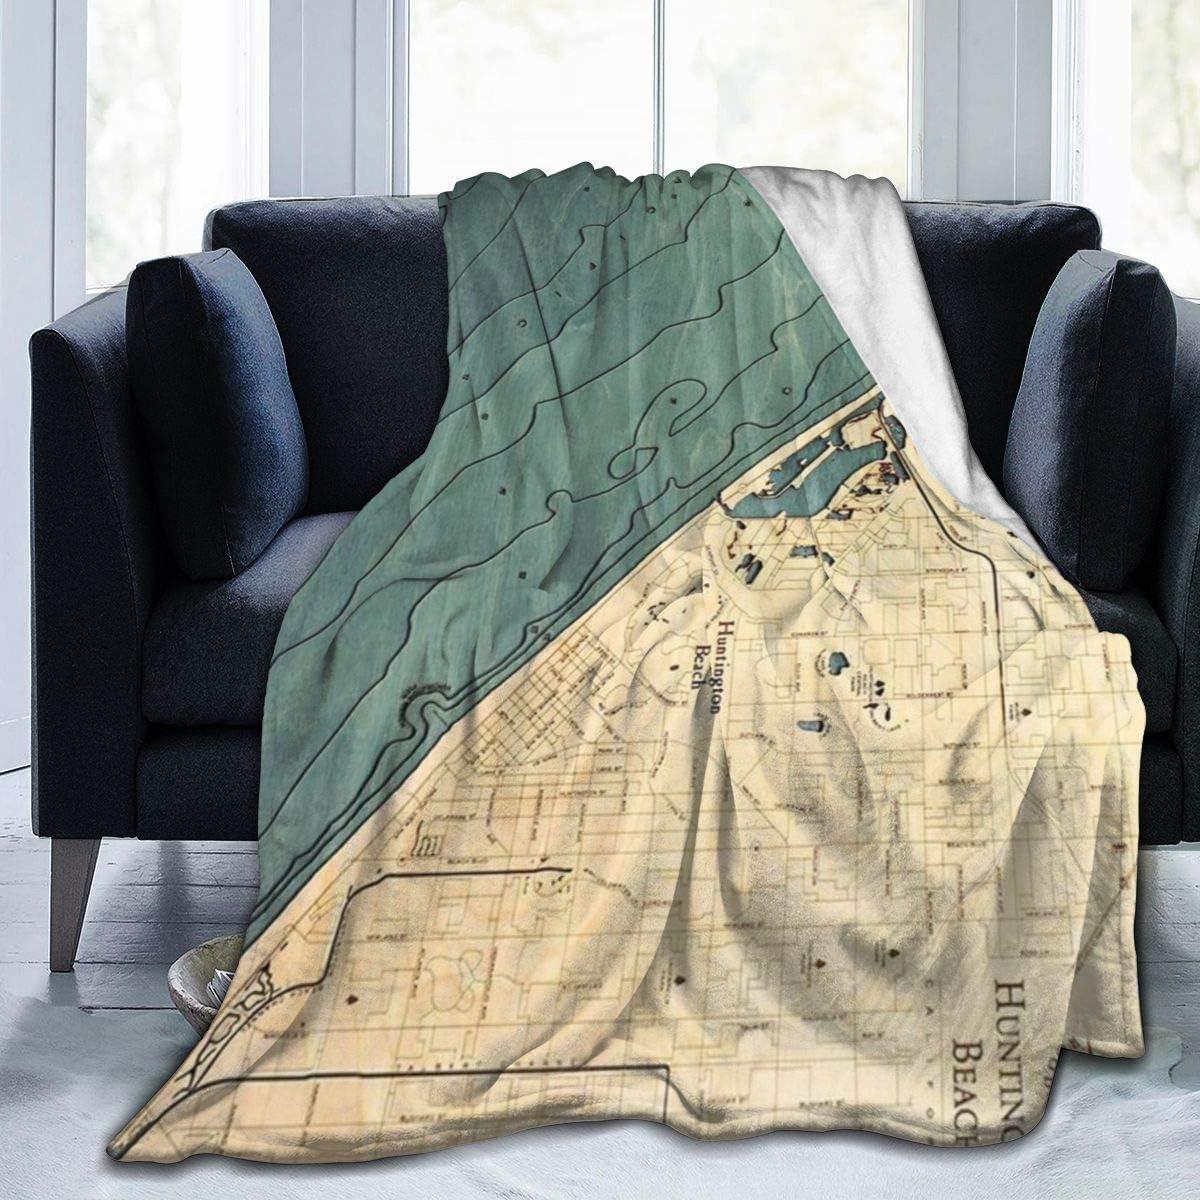 Super Soft Plush Micro Fleece Blanket Throw Rug Sofa Bedding Digital Print